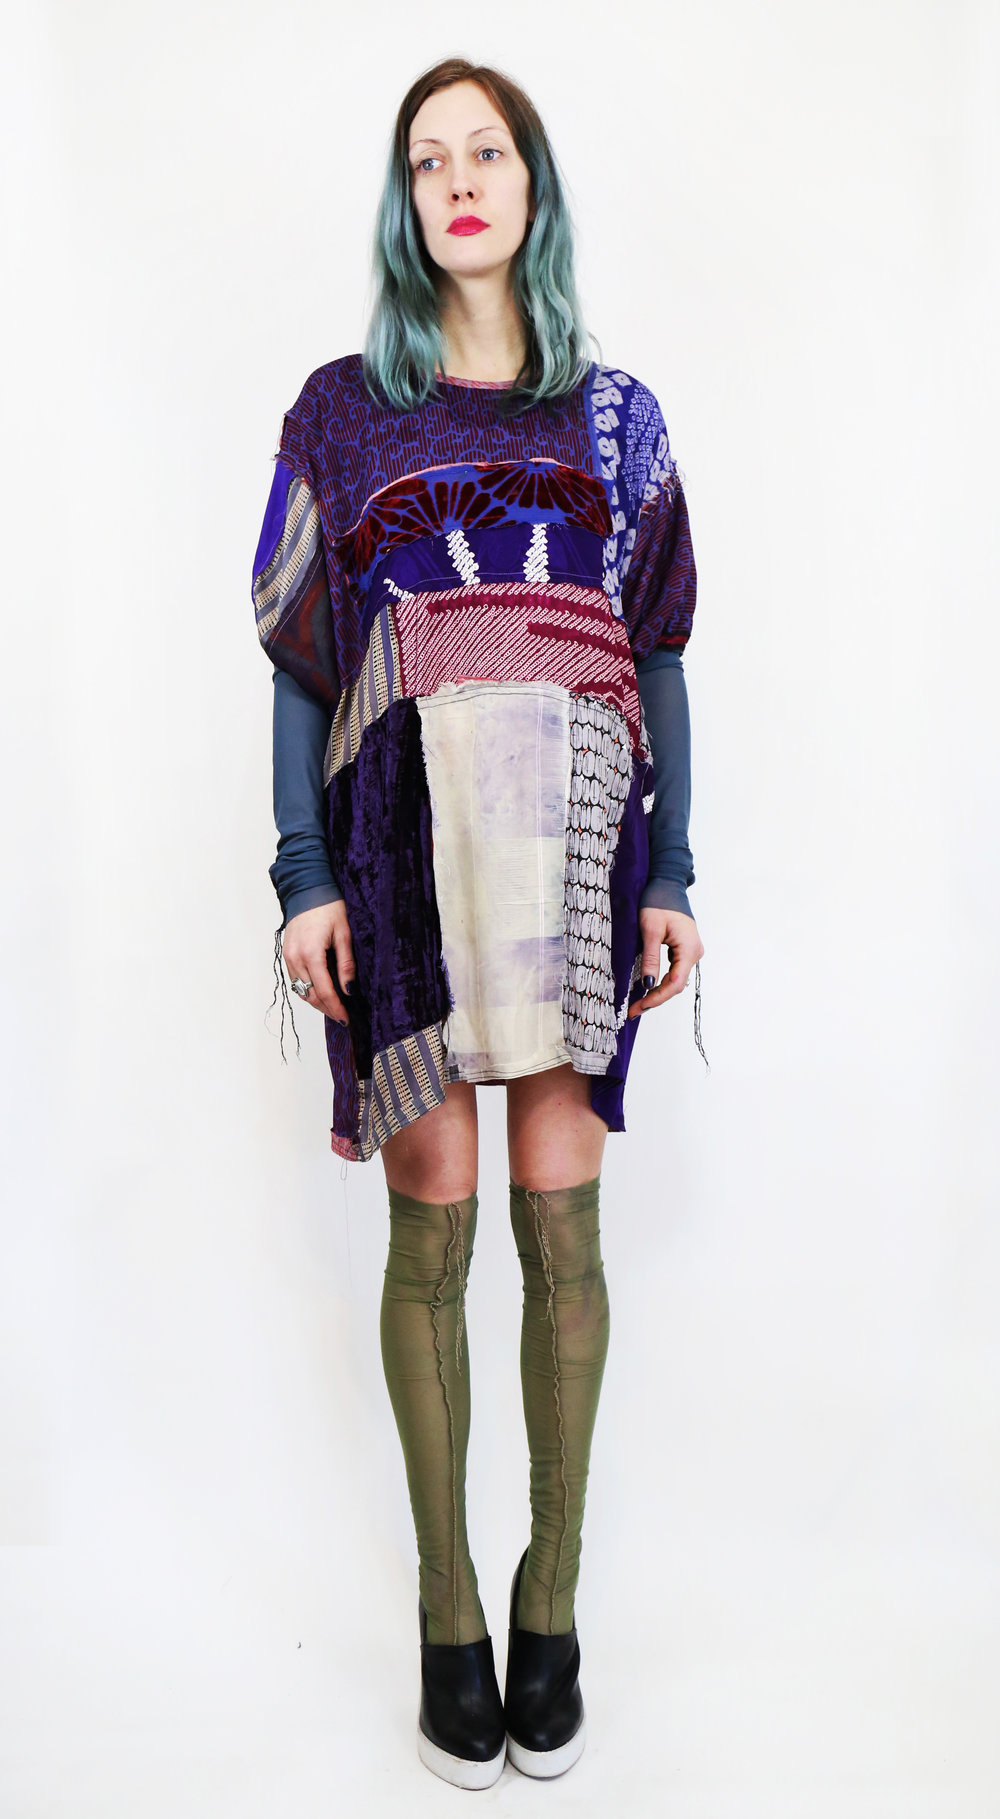 hadley_dress#1_1.jpg